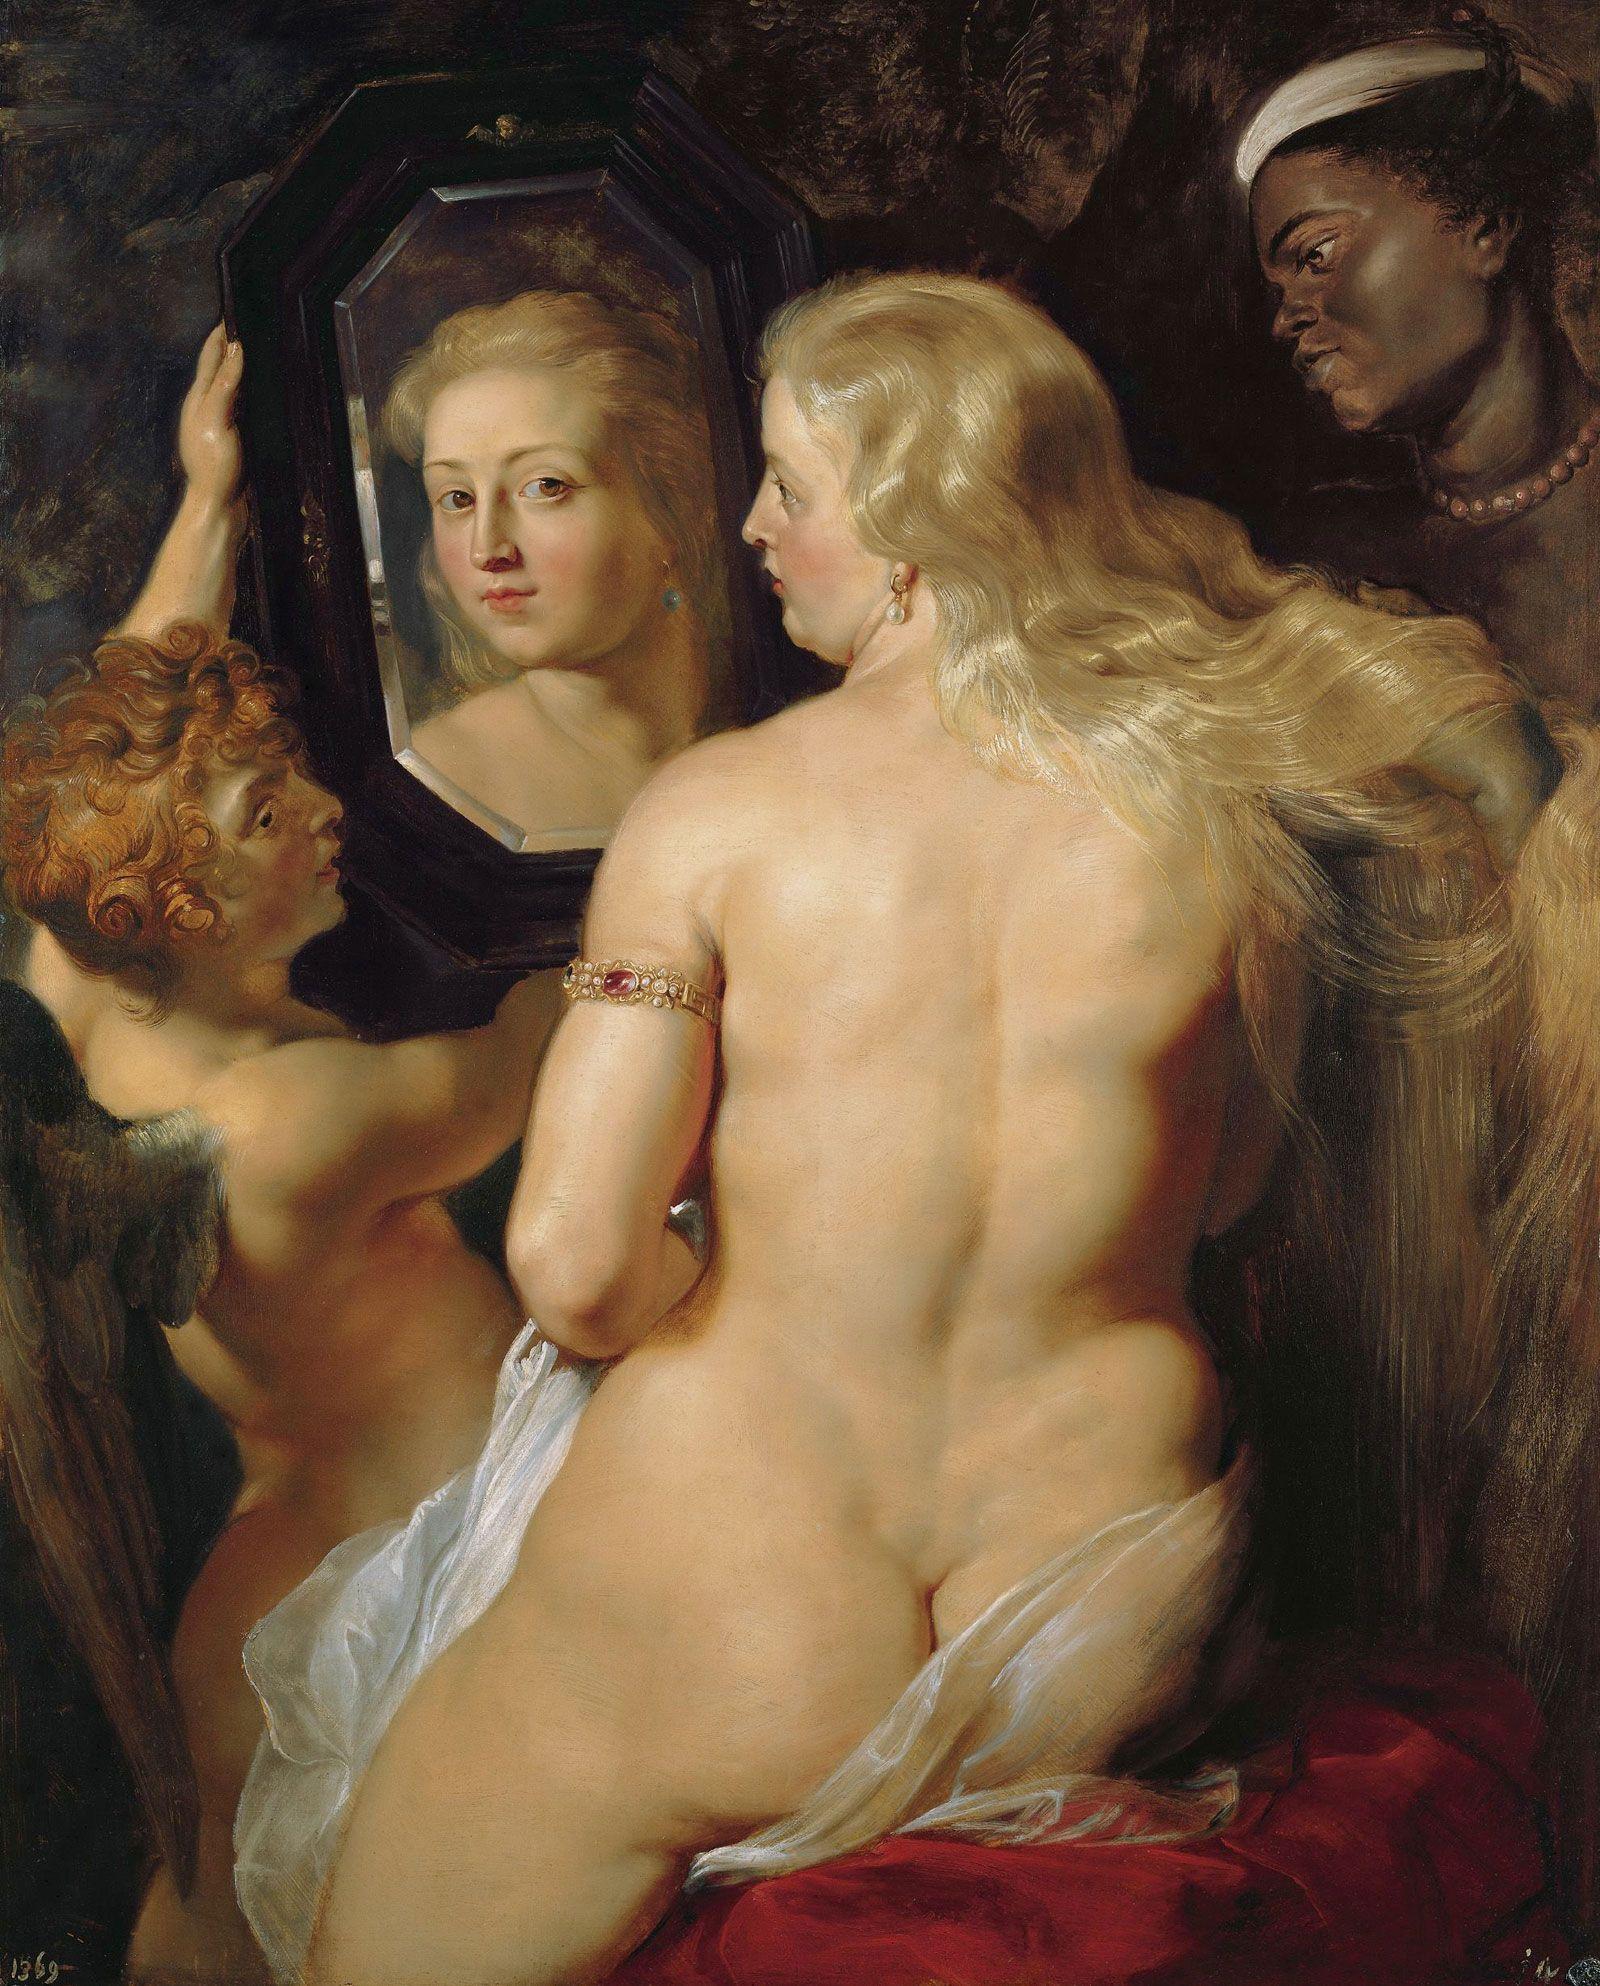 Ruben three nude women